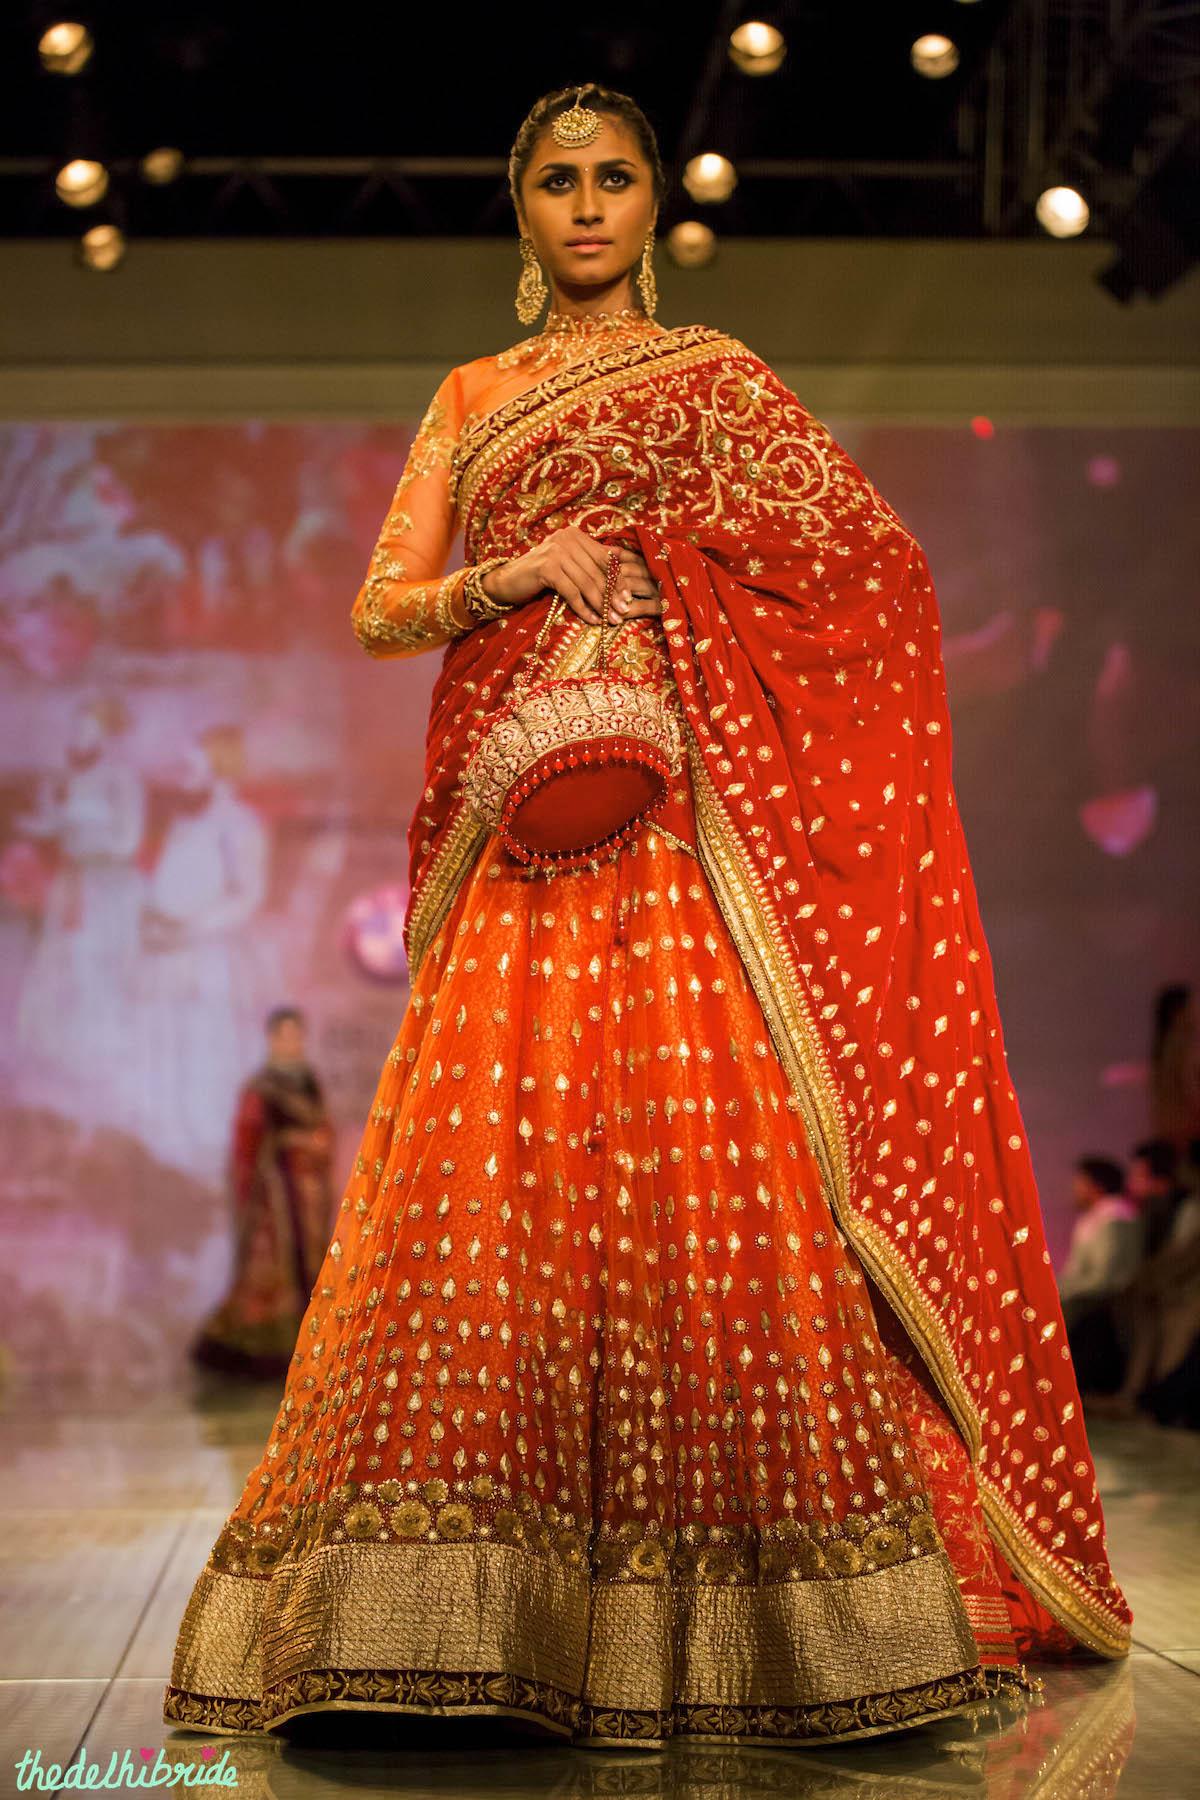 Image Result For Red Dresses For Weddings Uk